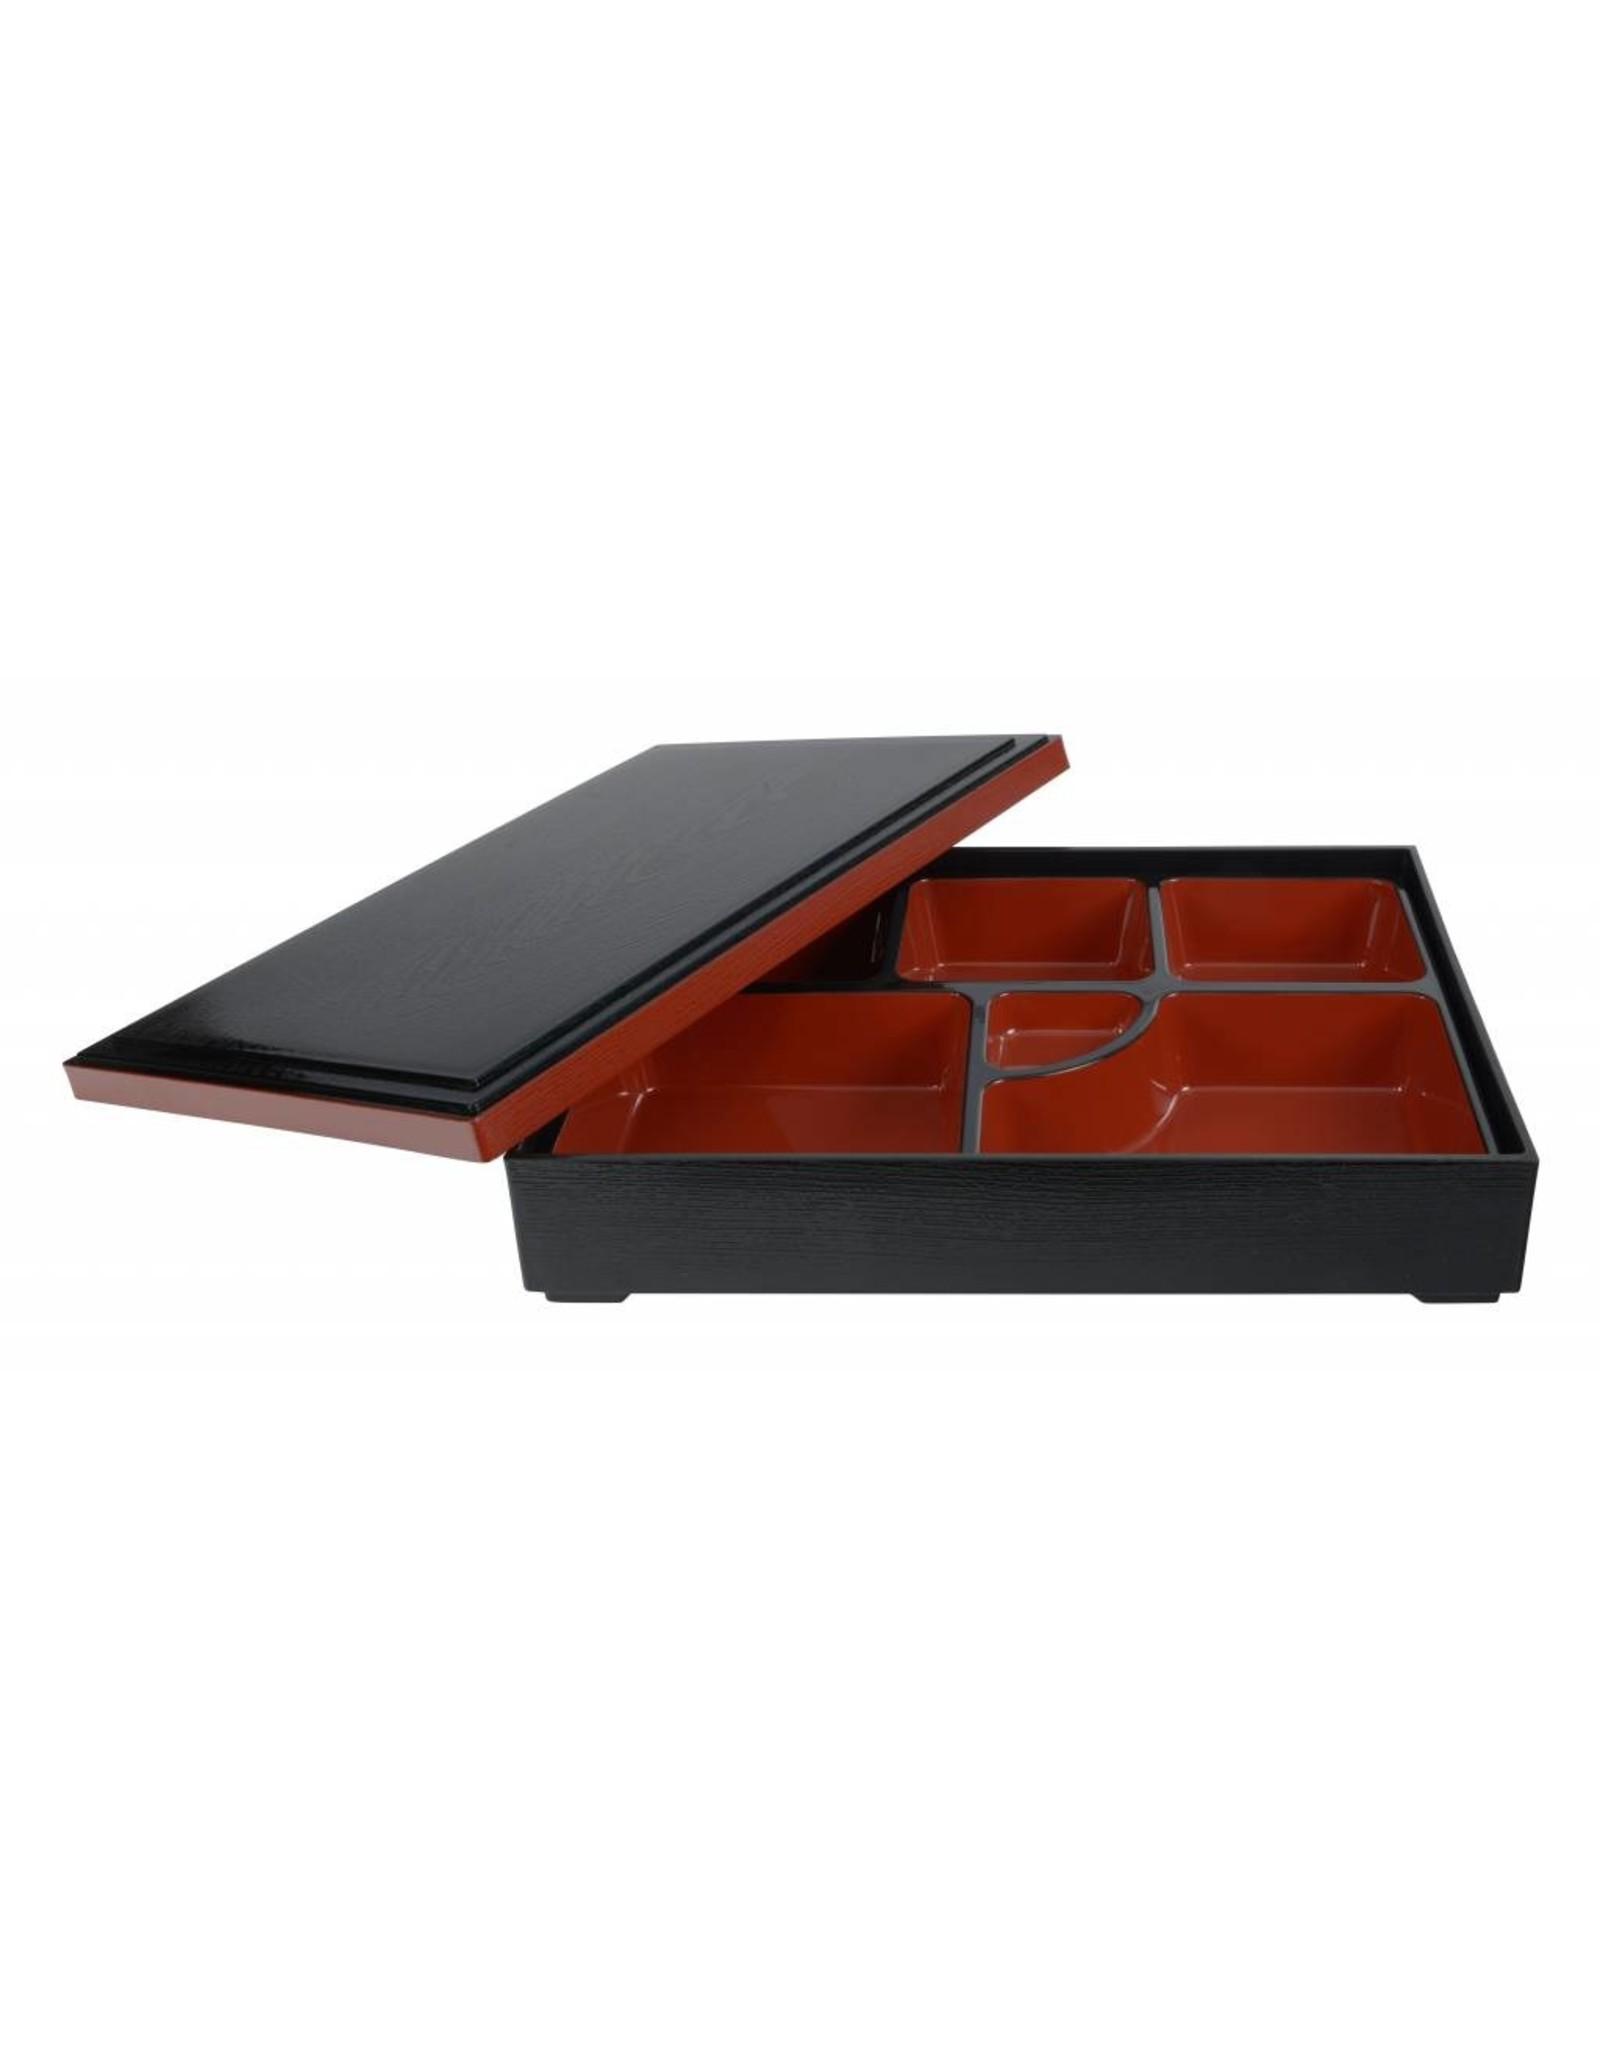 Tokyo Design Studio ABS Lacquerware Bento Box 35x26cm zwart/rood